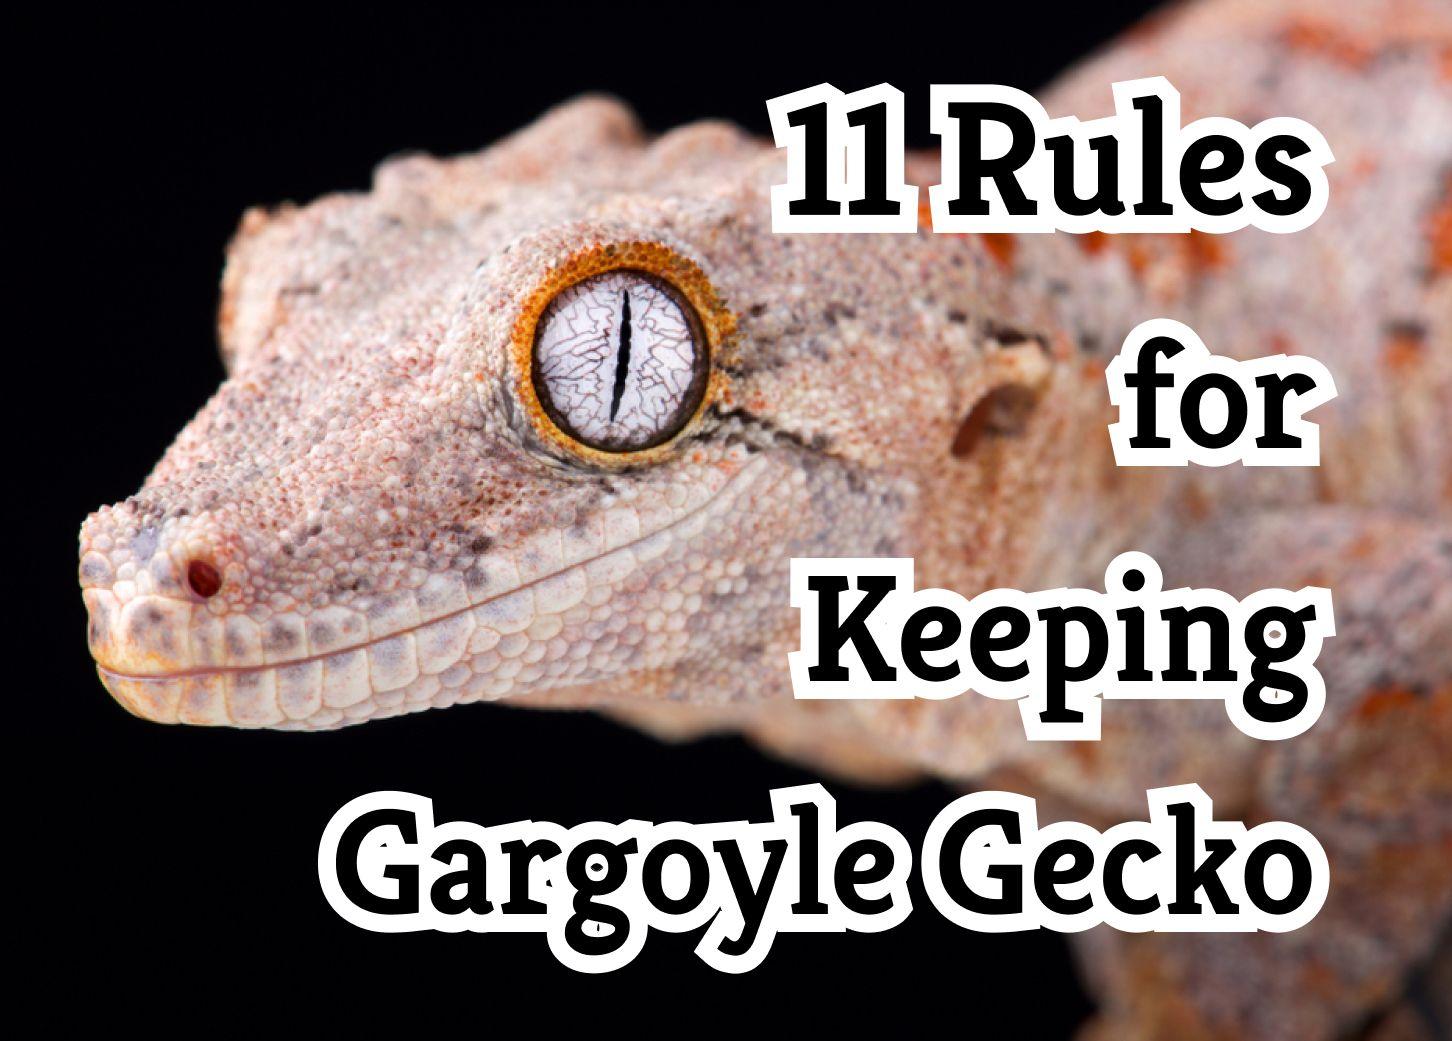 Keeping Gargoyle Gecko – 11 Secrets For Success